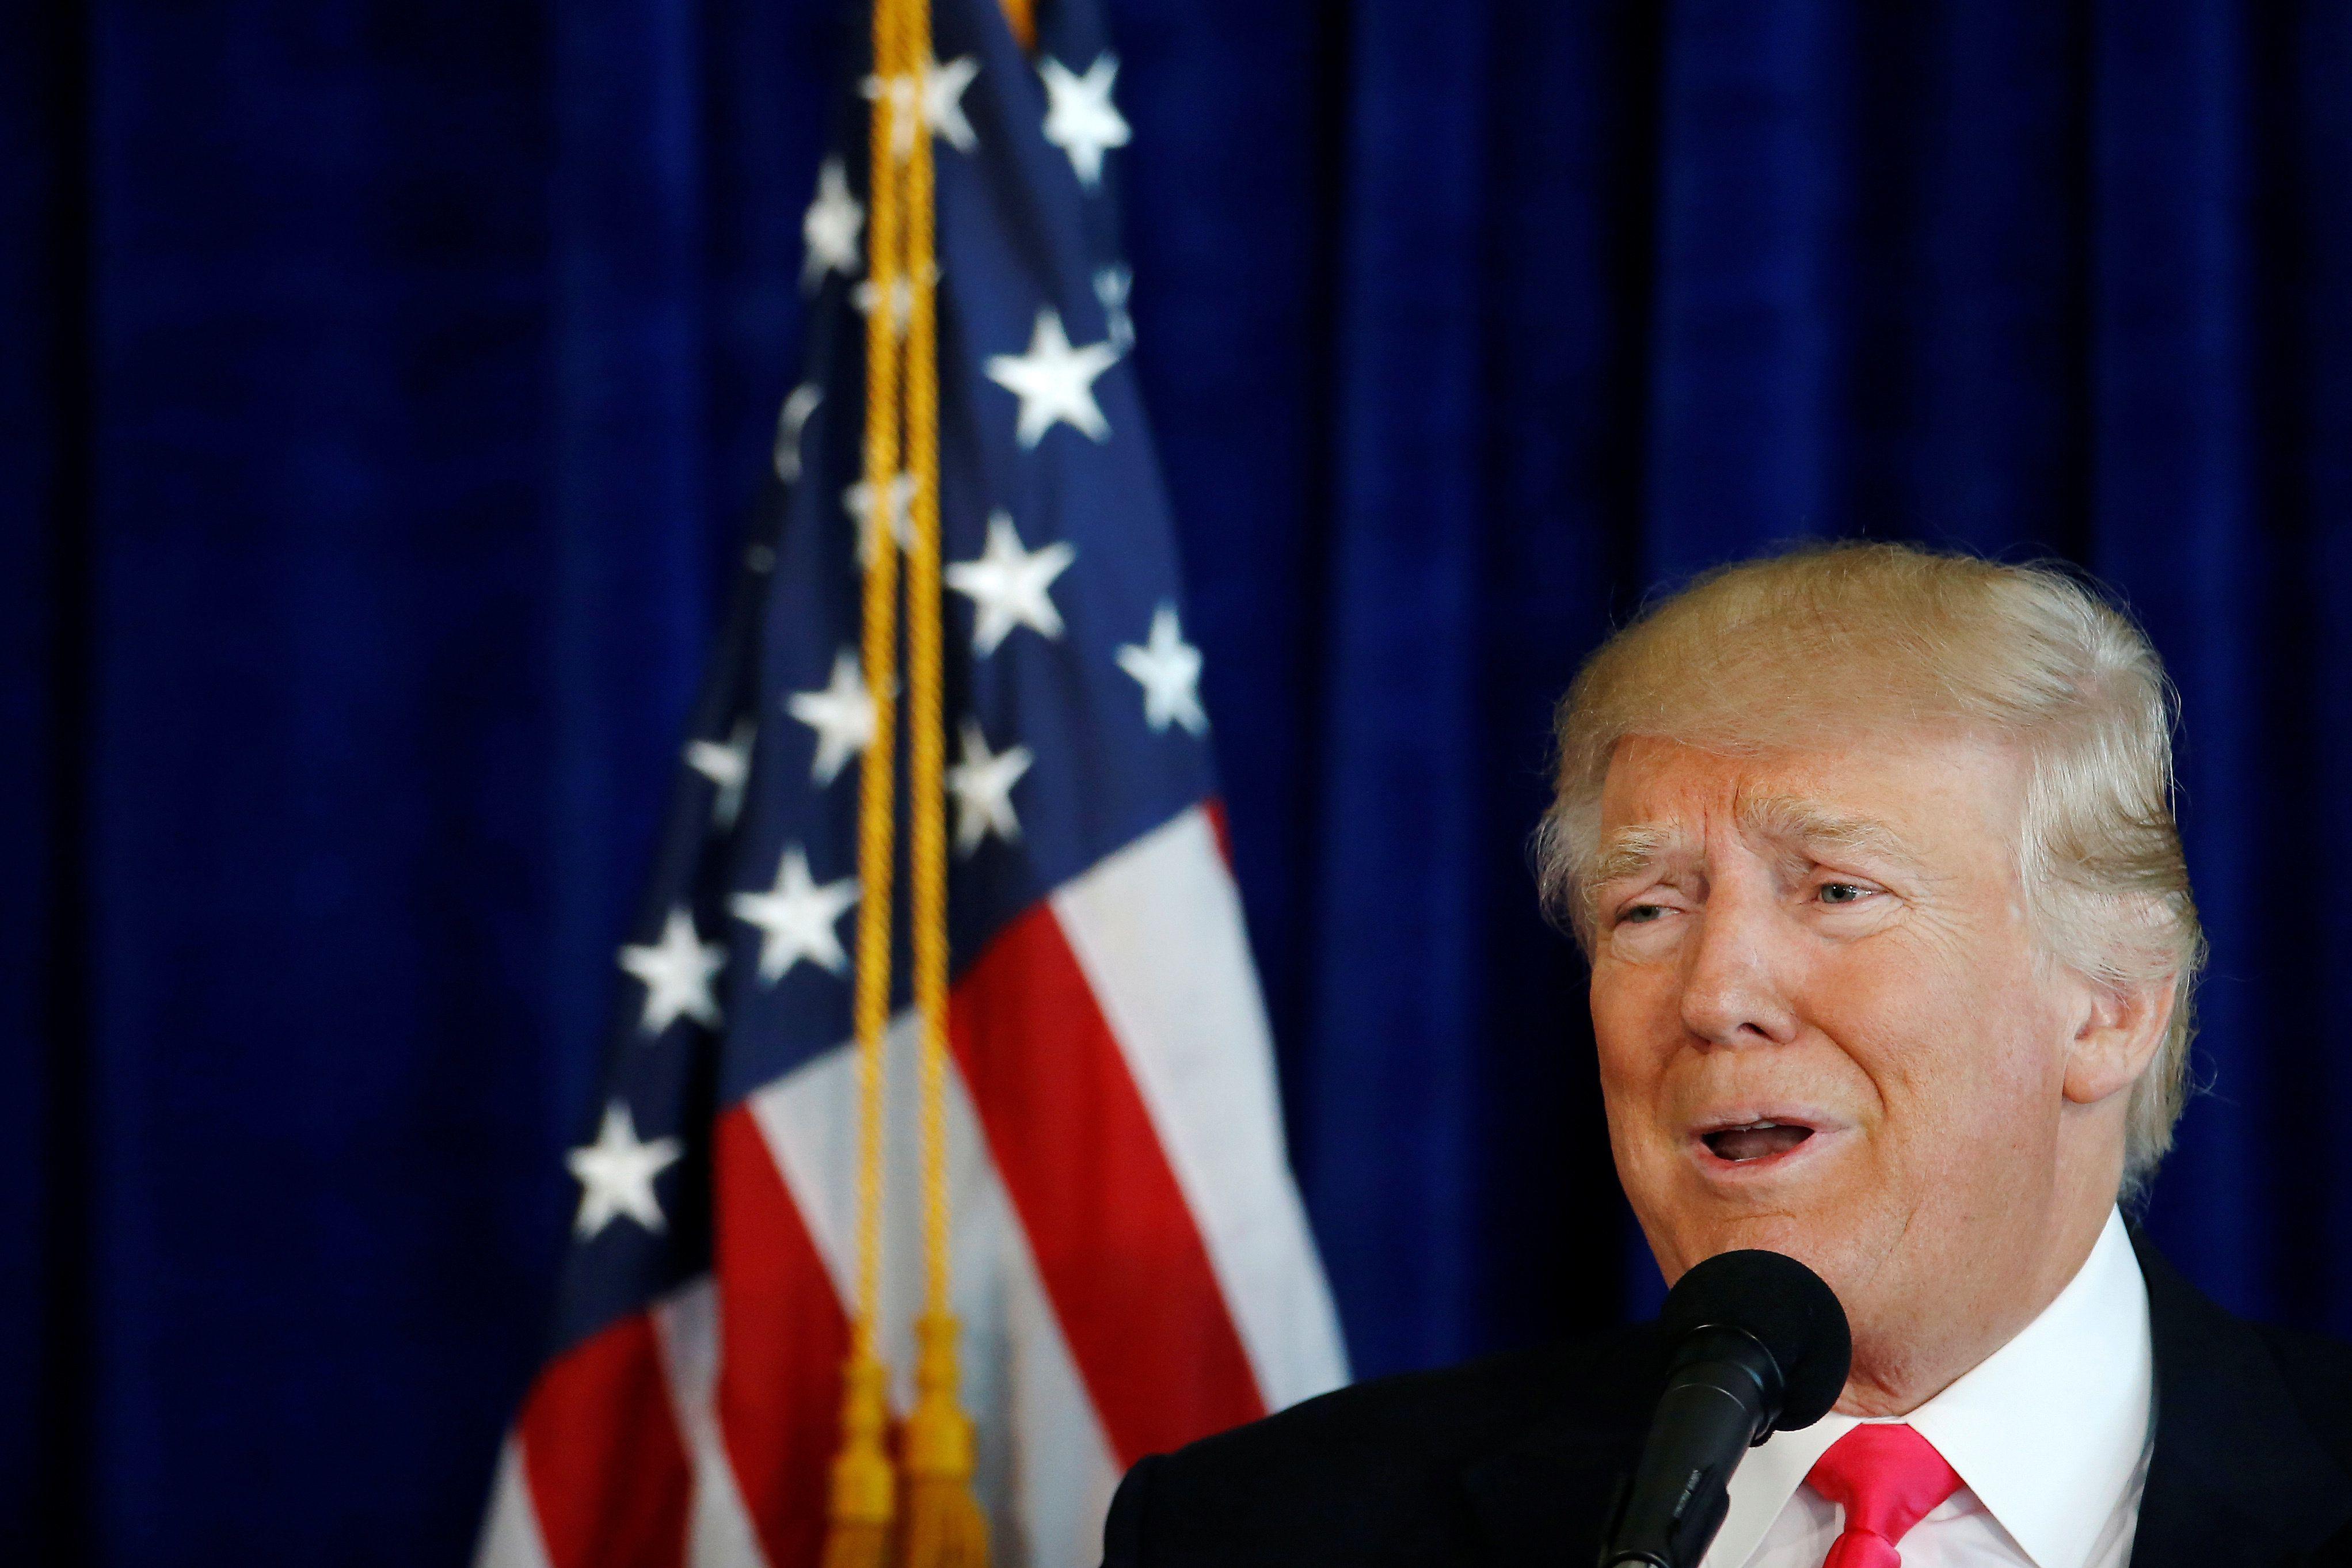 U.S. Republican presidential nominee Donald Trump speaks at a campaign event at Trump Doral golf course in Miami, July 27, 20